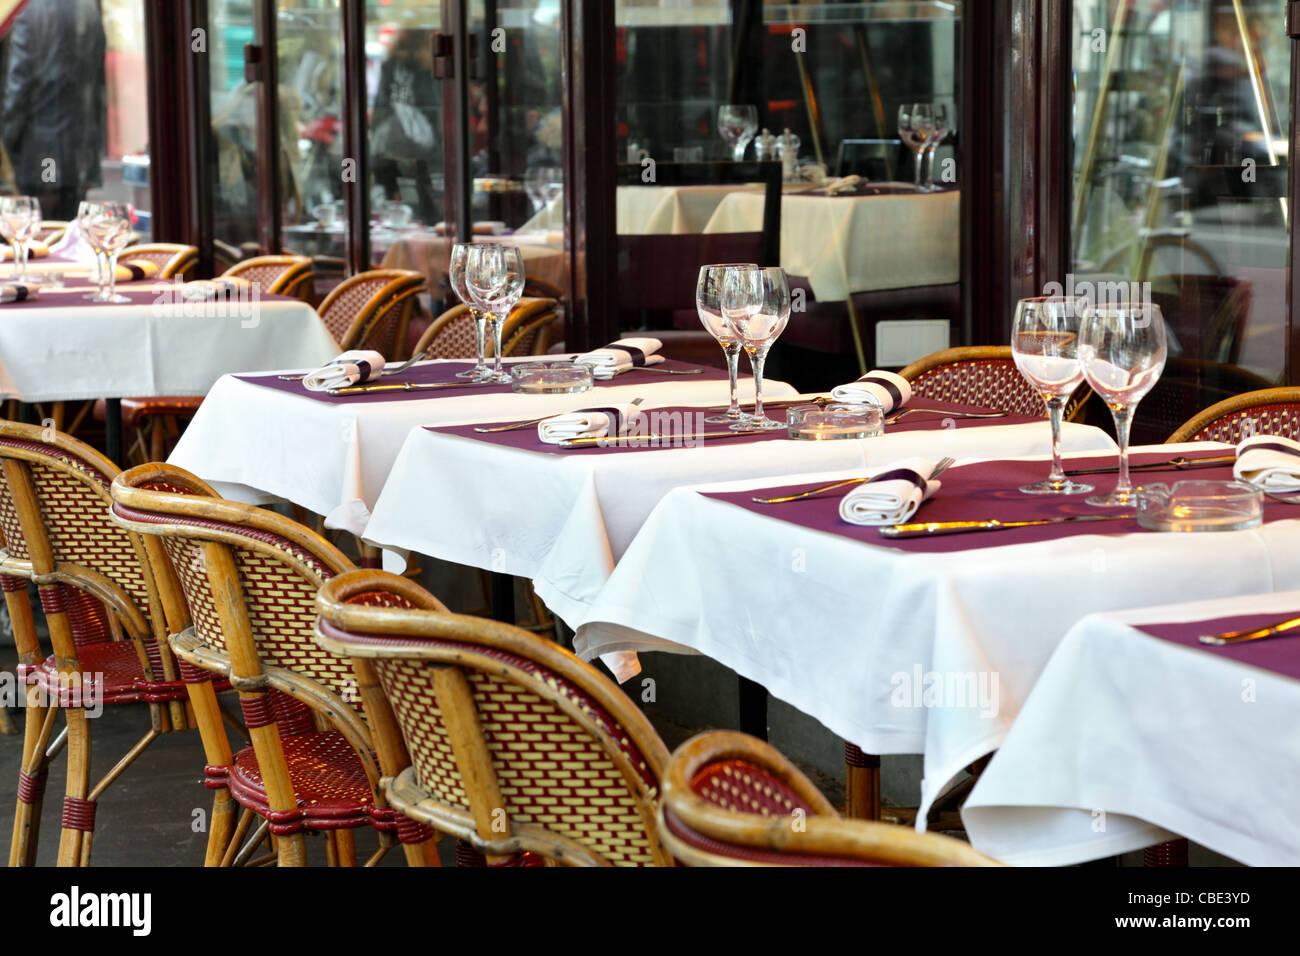 Street cafe in Paris - Stock Image